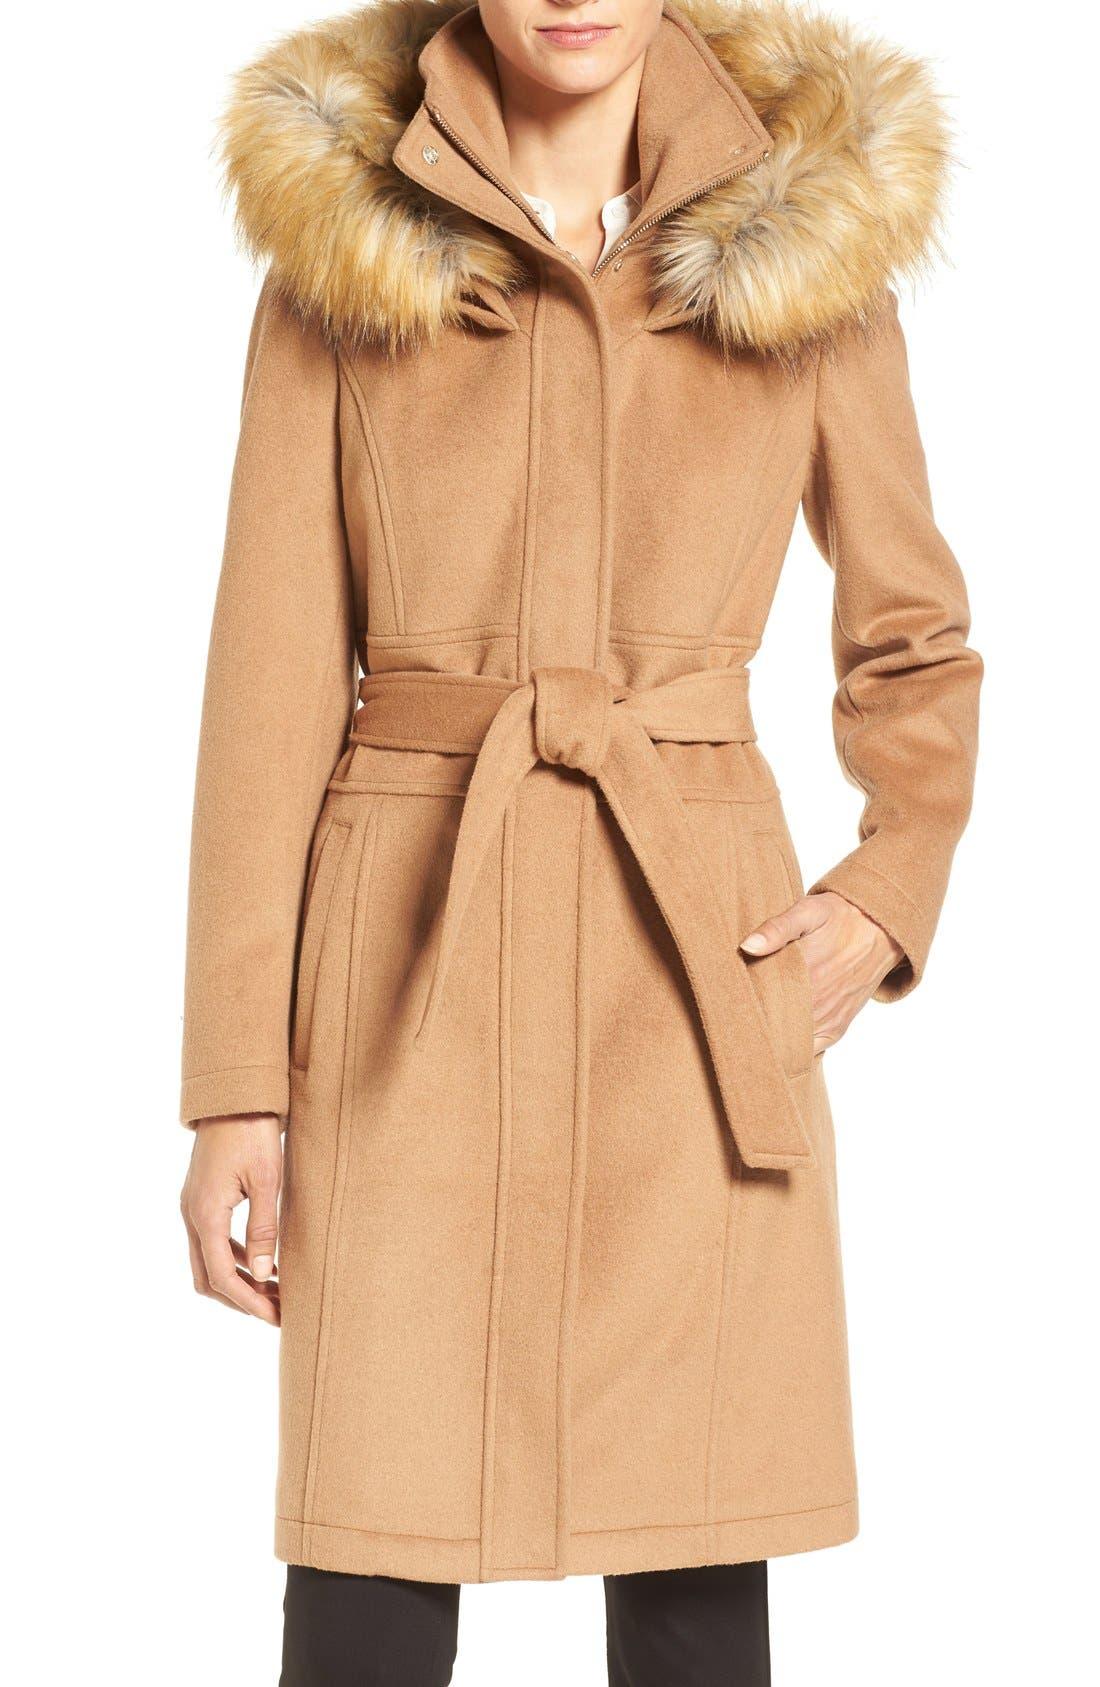 Main Image - Ivanka Trump Wool Blend Coat with Removable Faux Fur Trim Hood